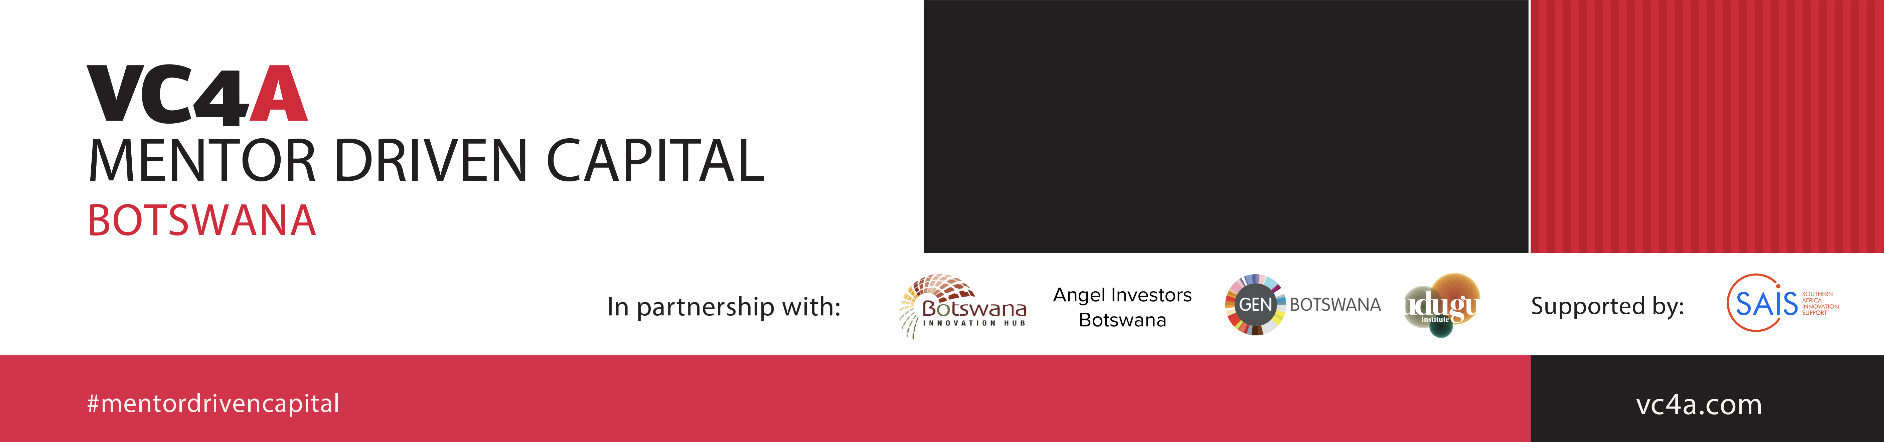 Mentor Driven Capital program Botswana 2020